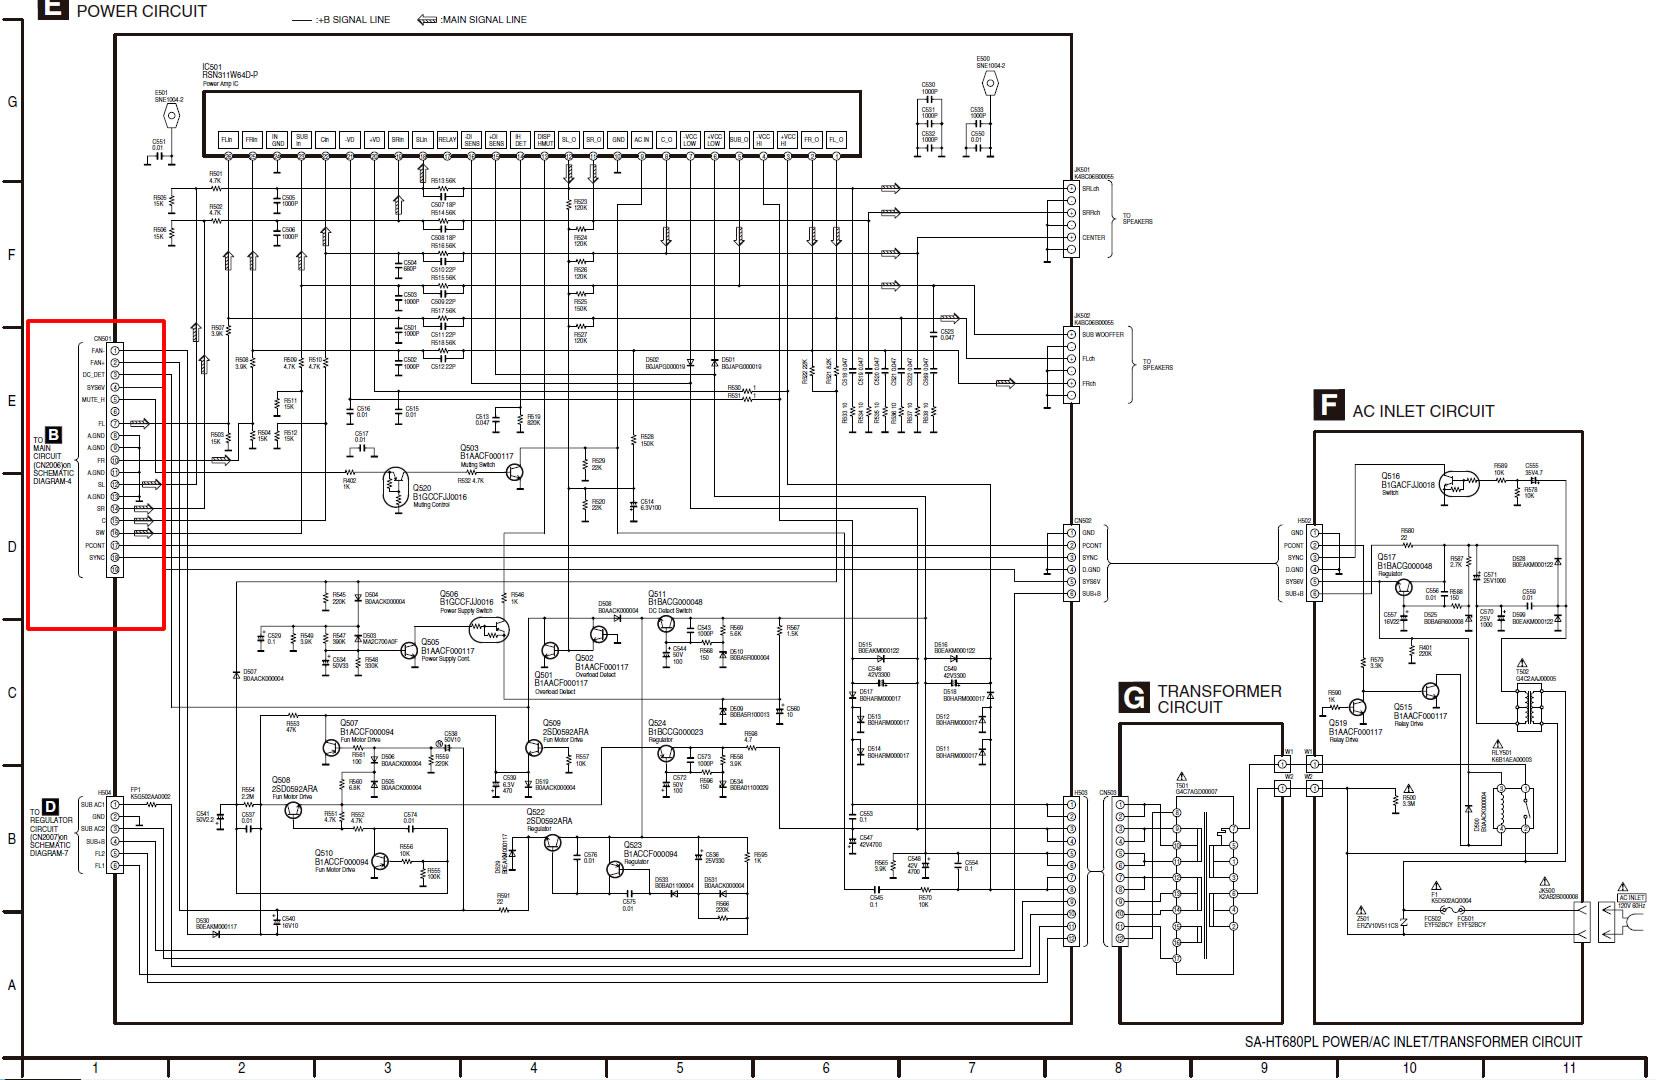 home theater panasonic sa-ht680 5.1 anular compactera